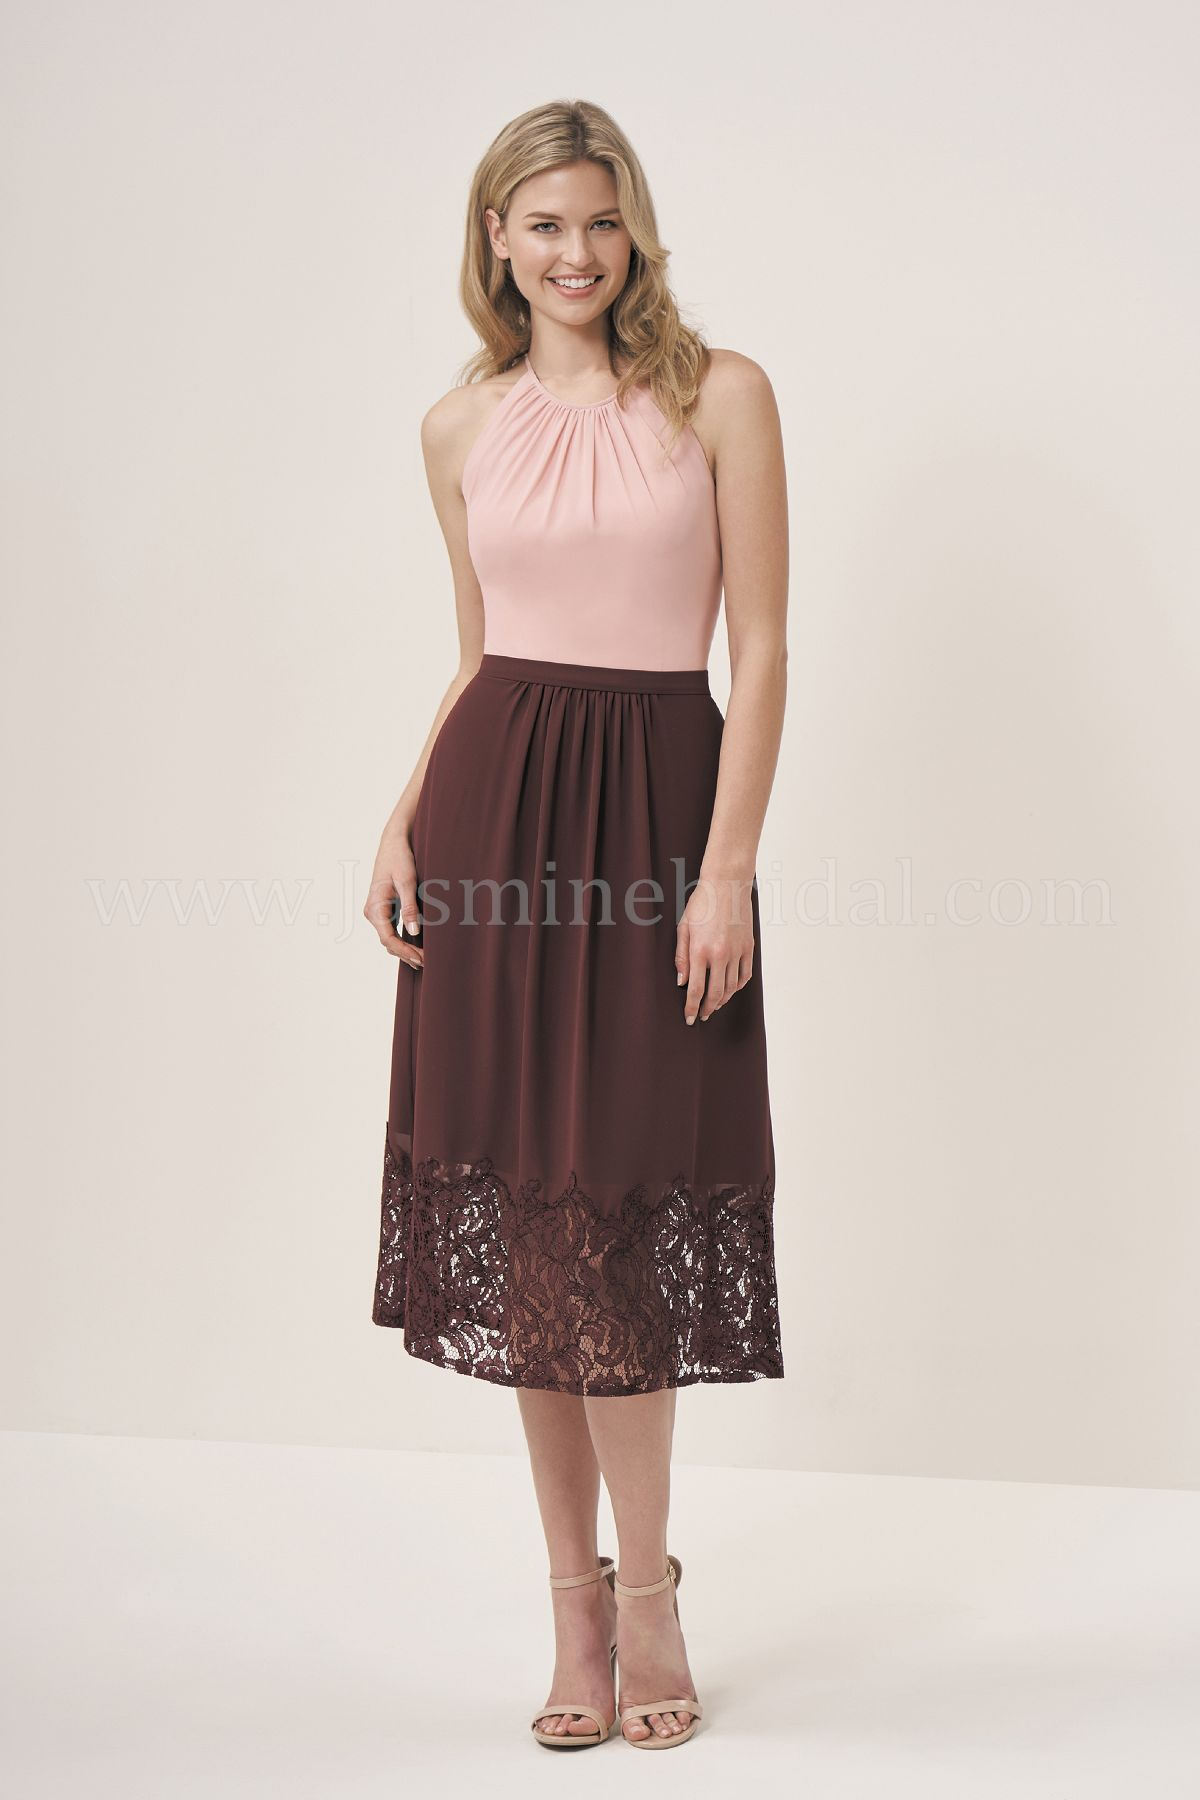 bridesmaid-dresses-P196064K-F